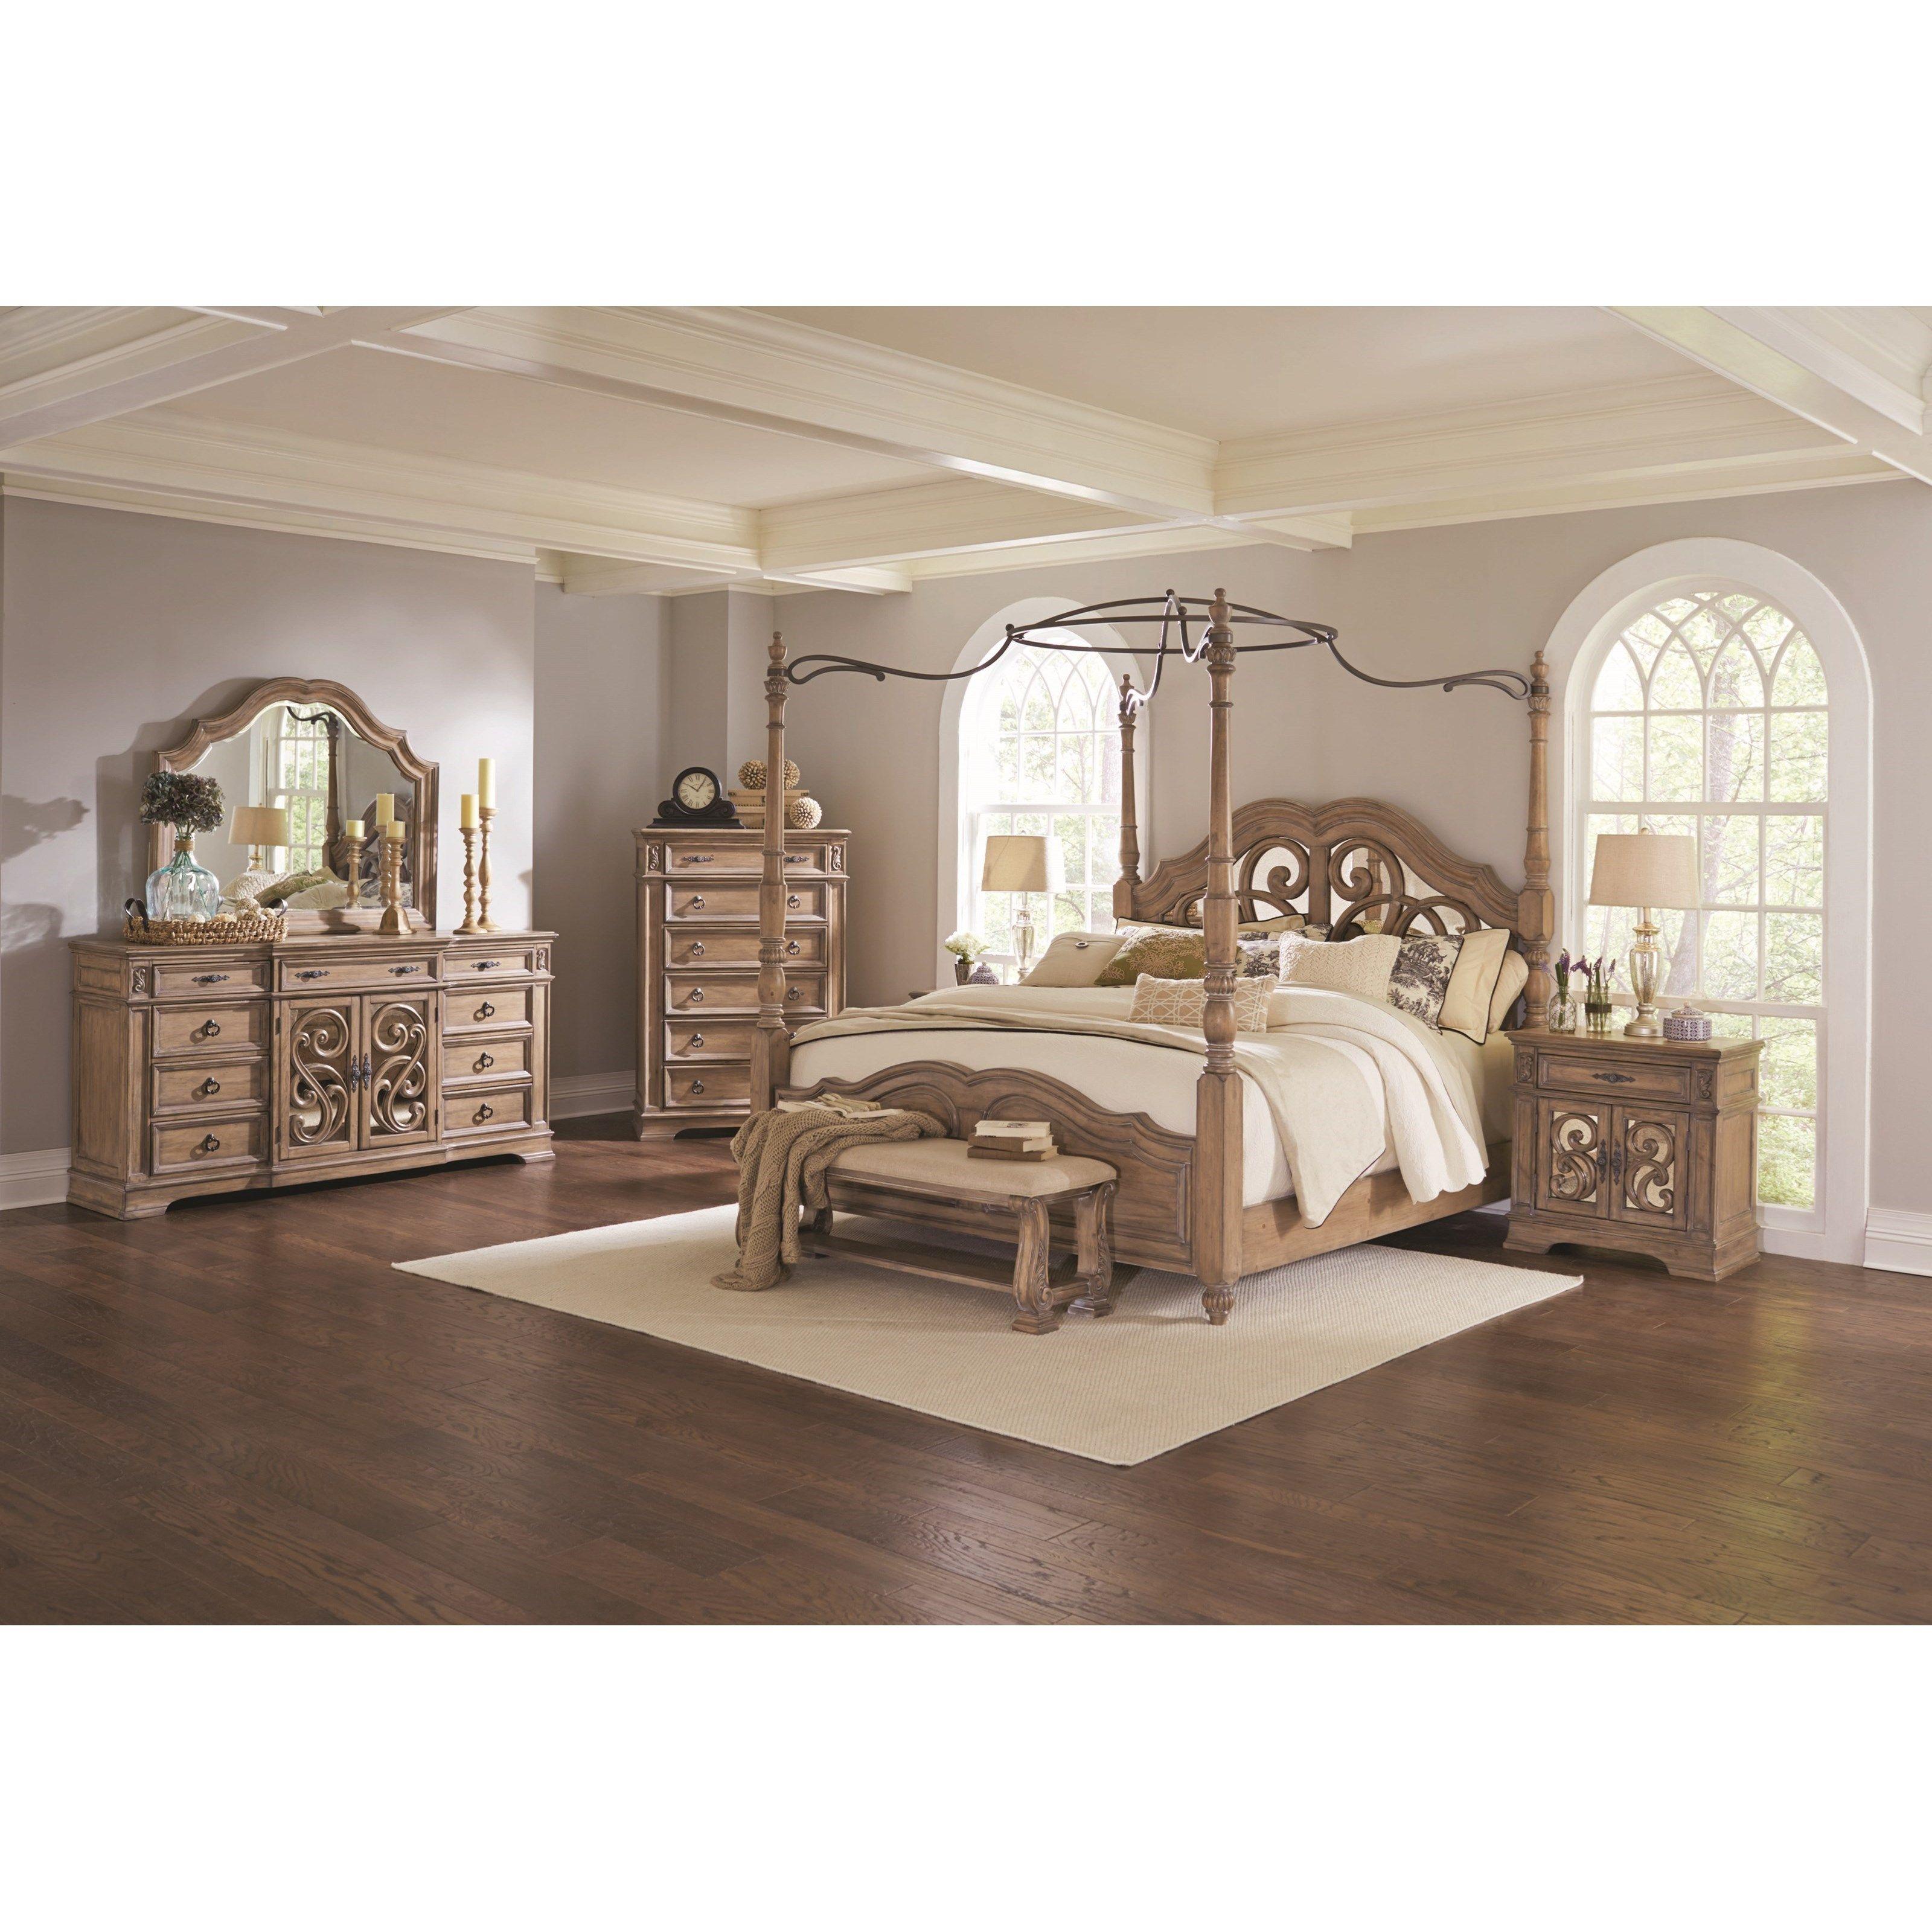 Coaster Ilana King Bedroom Group Value City Furniture Bedroom